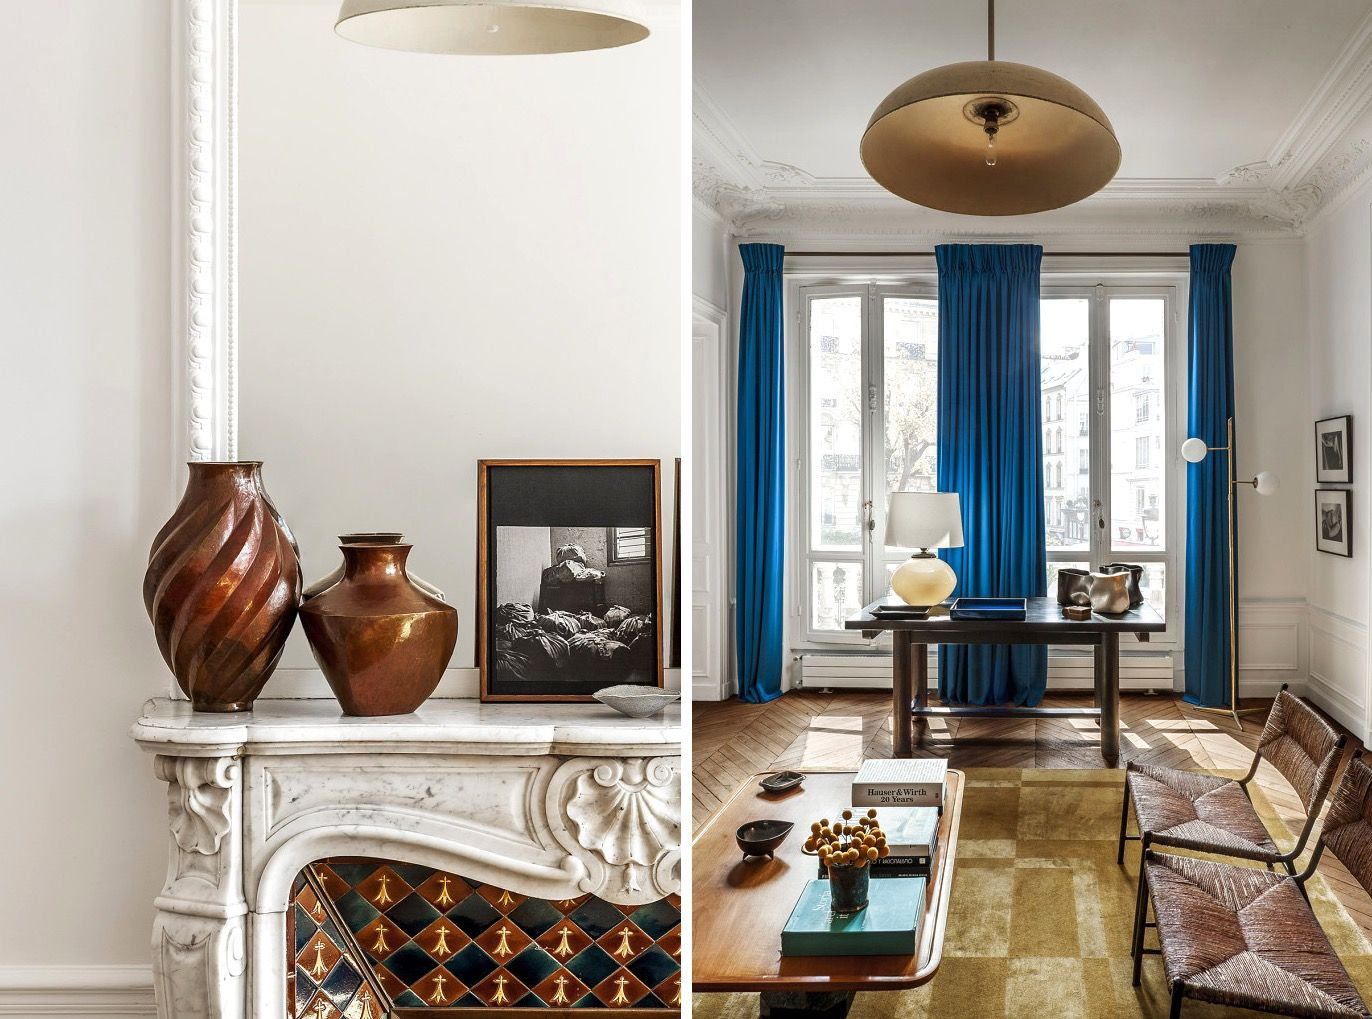 matthieu salvaing interior photography | interior photography